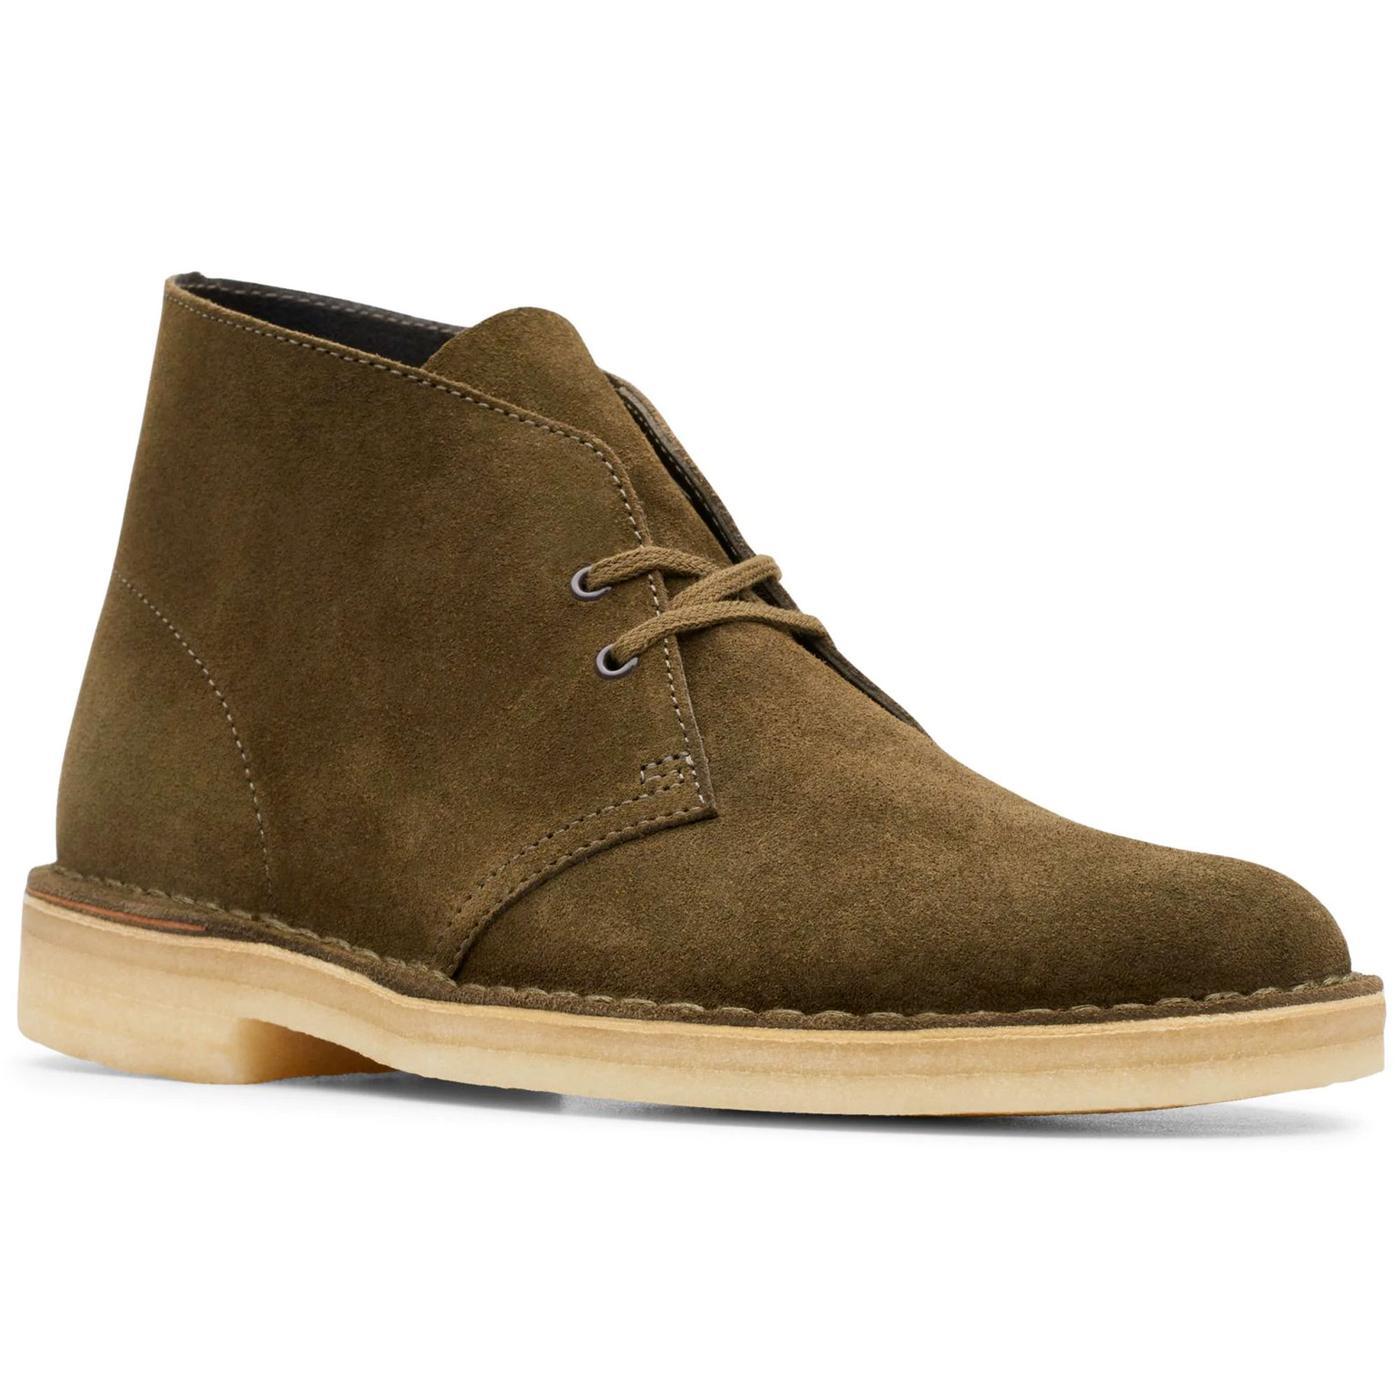 CLARKS ORIGINALS Men's Mod Suede Desert Boots (DO)